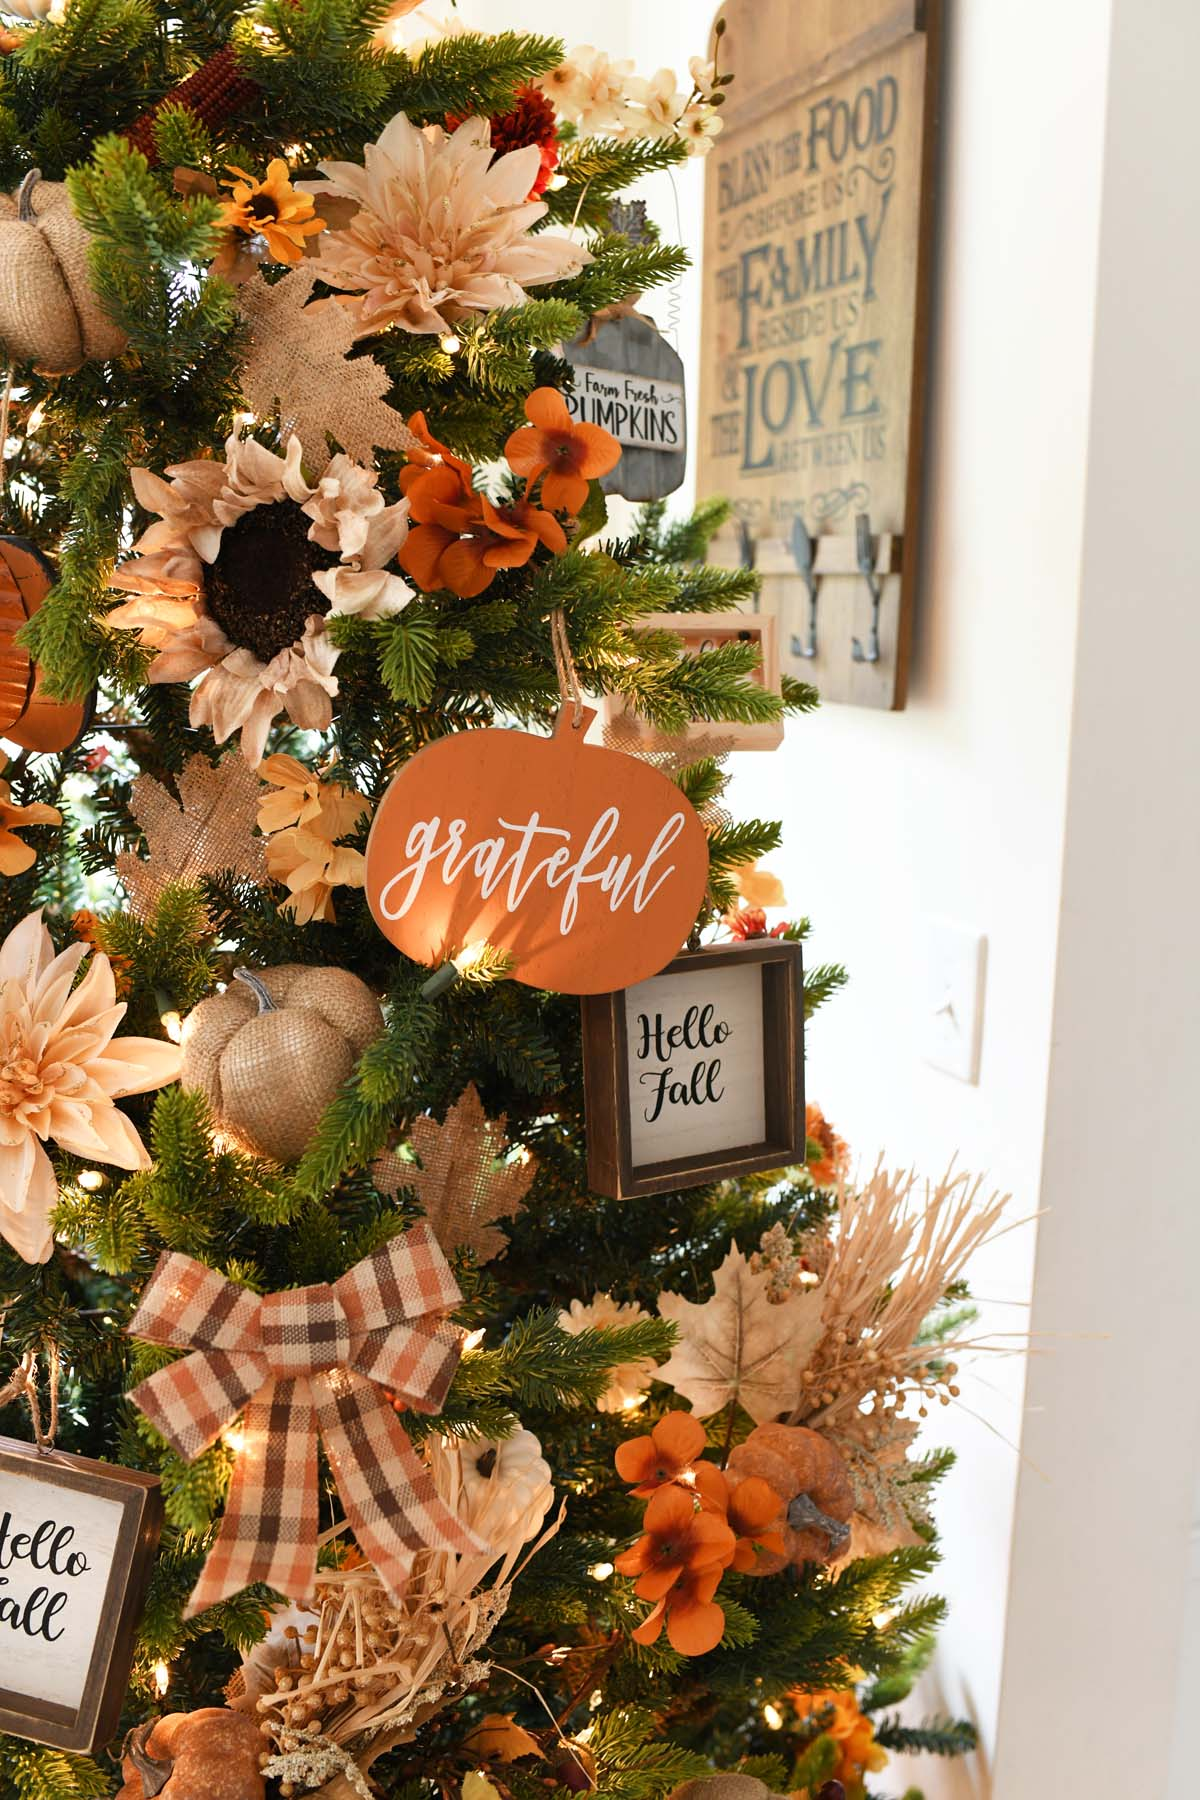 Orange pumpkin grateful ornament on a green tree.